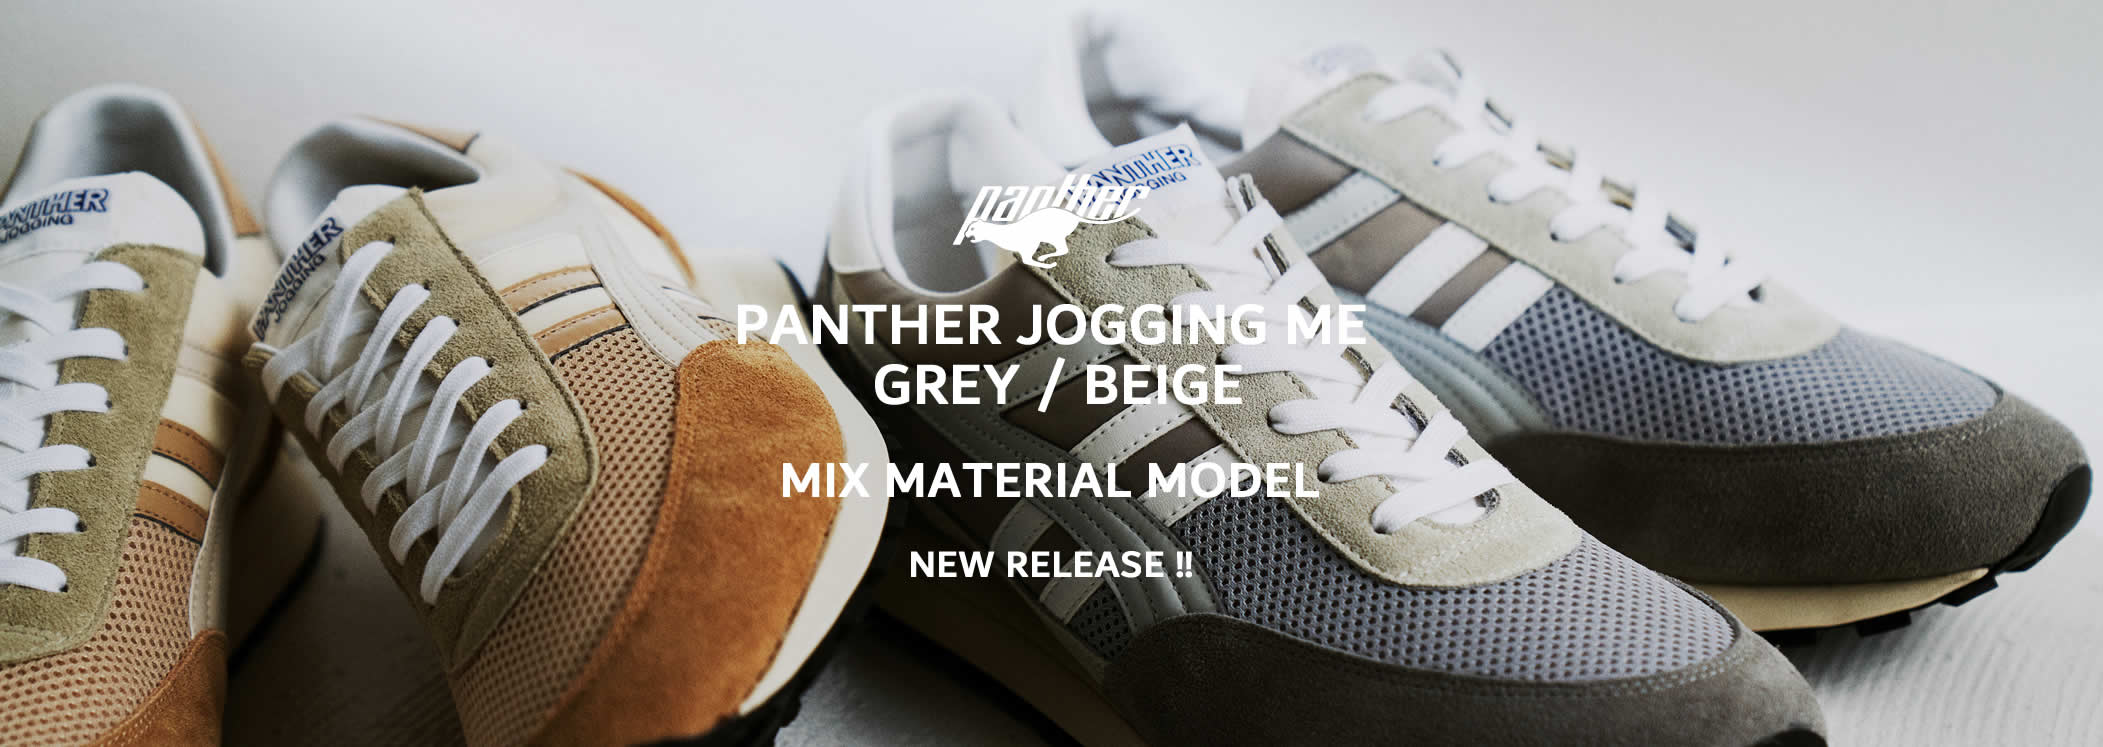 12-pa-ptj-0016-gray-beige-1